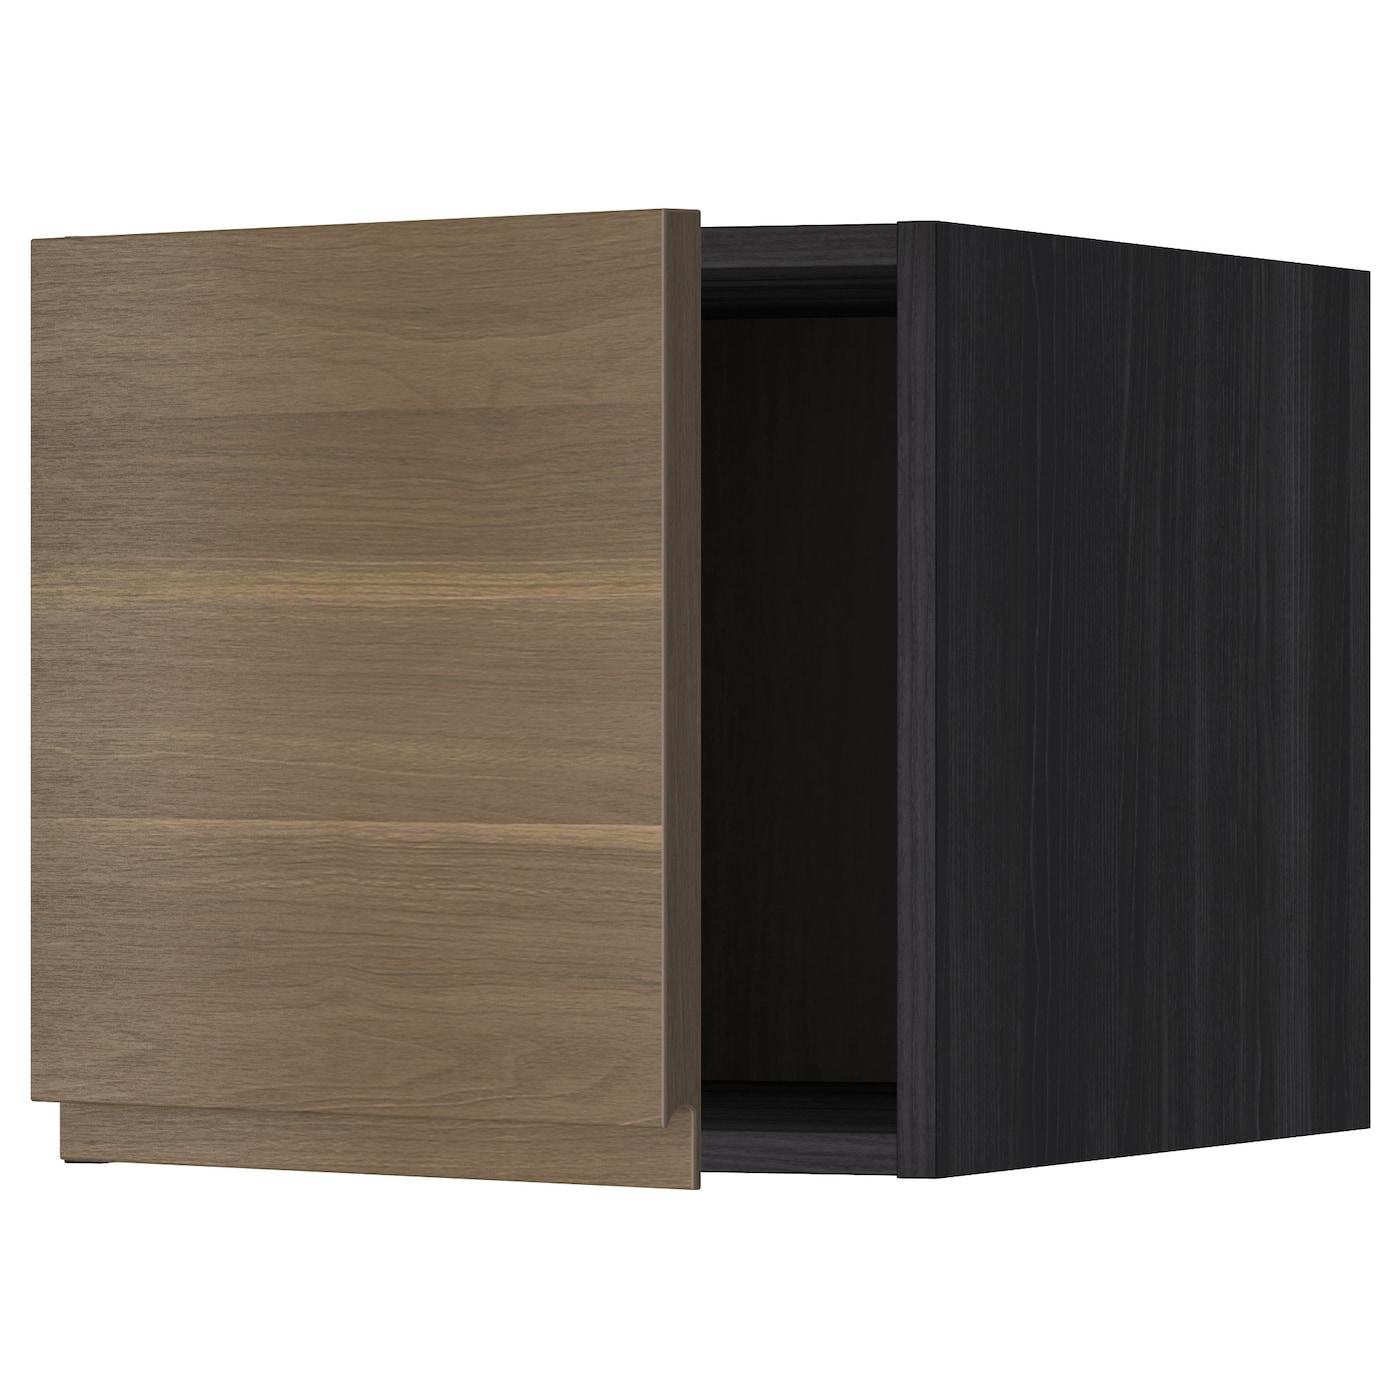 metod top cabinet black voxtorp walnut 40x40 cm ikea. Black Bedroom Furniture Sets. Home Design Ideas